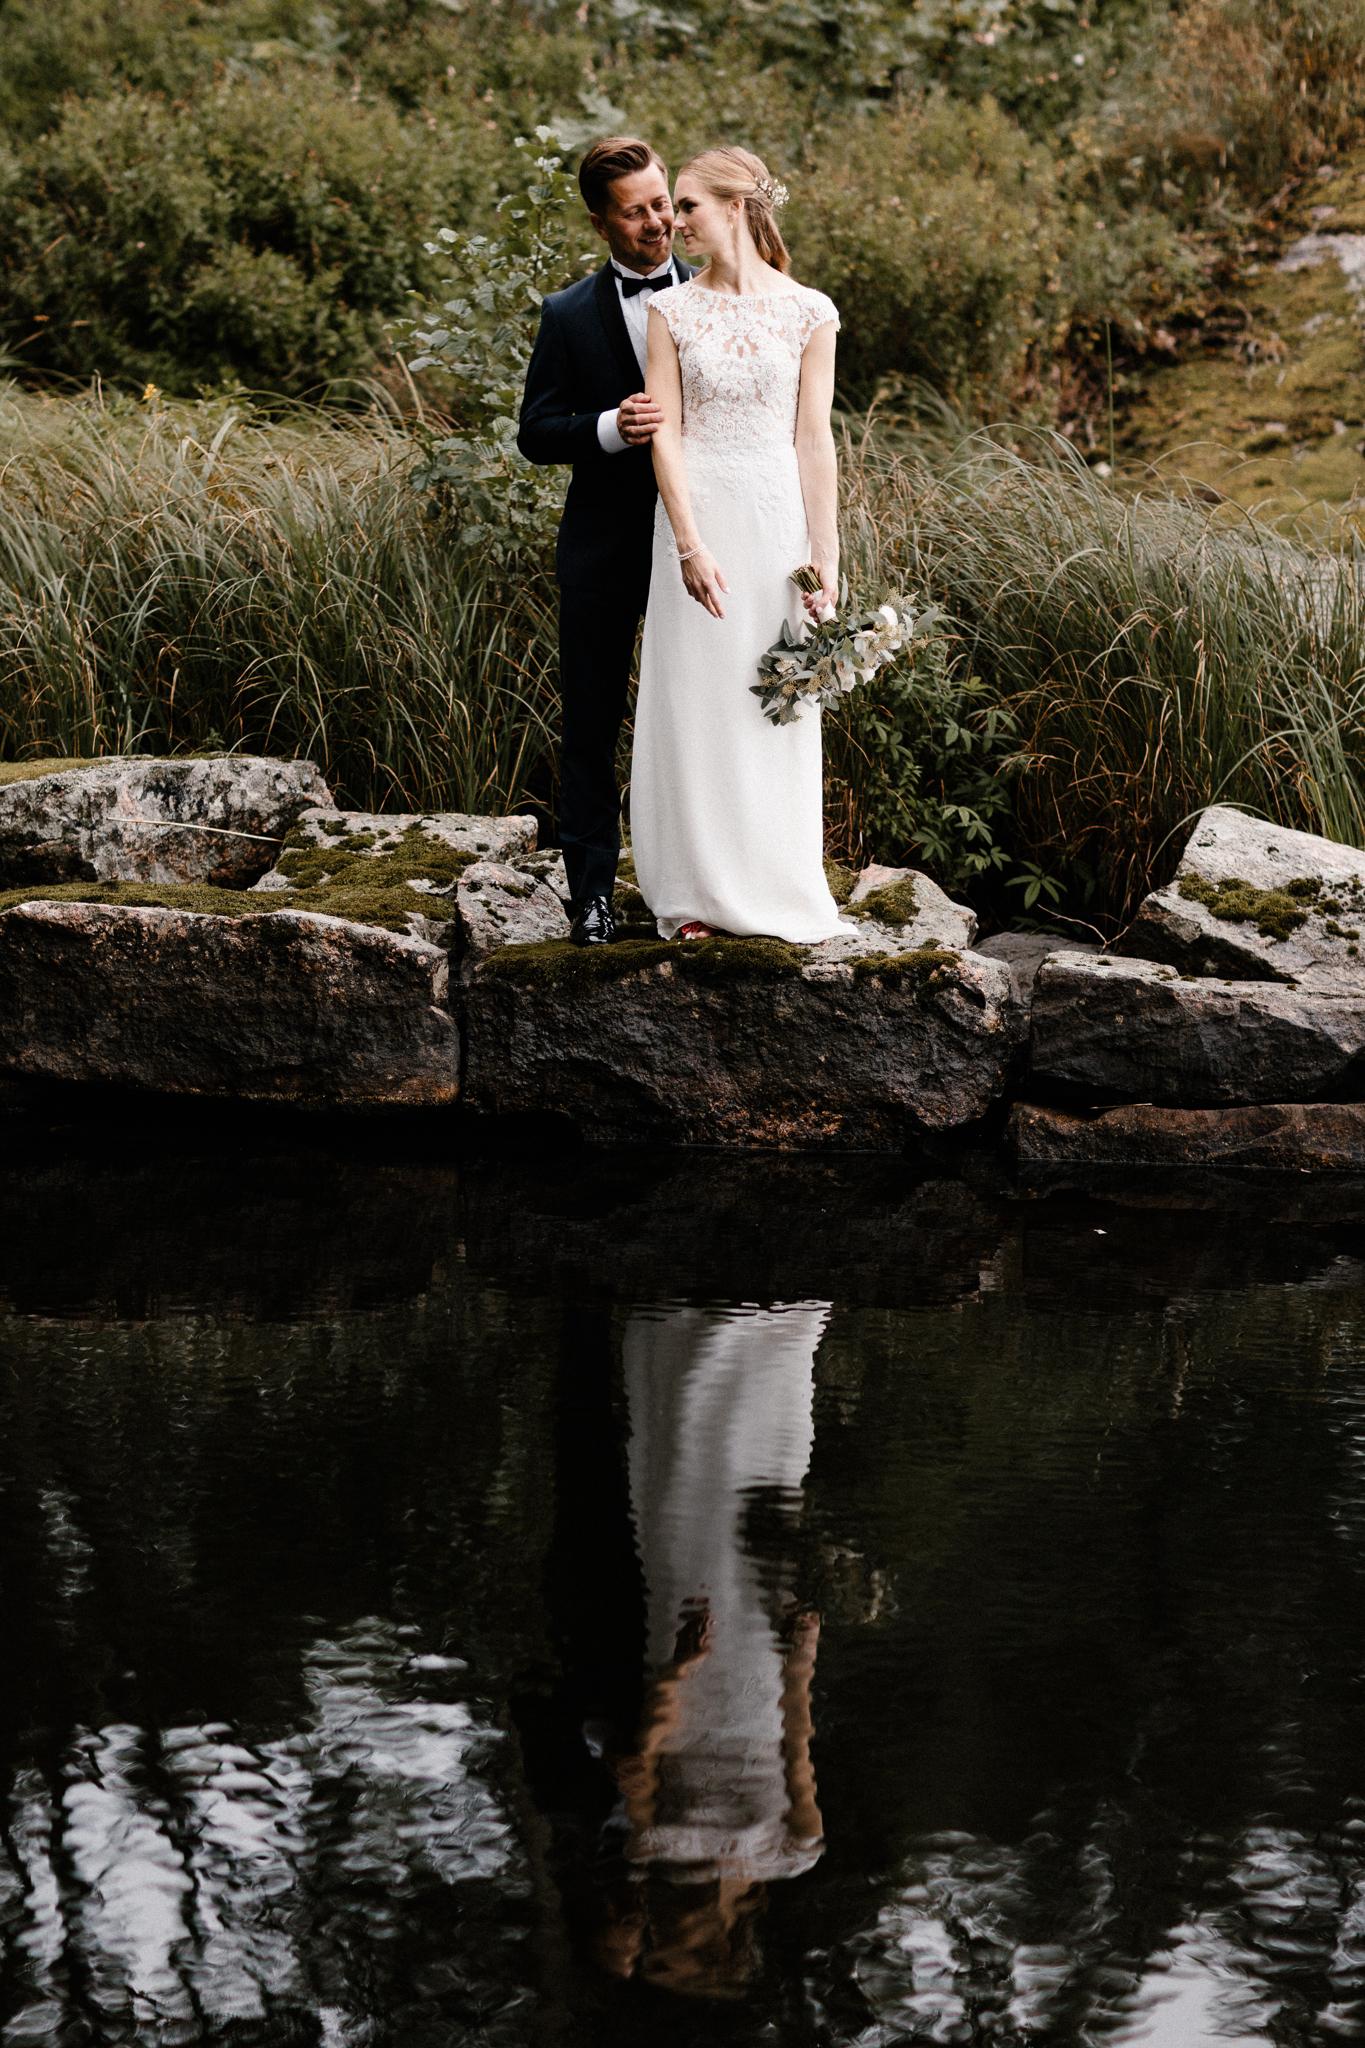 Jessica + Patrick | Fagervik | by Patrick Karkkolainen Wedding Photography-12.jpg